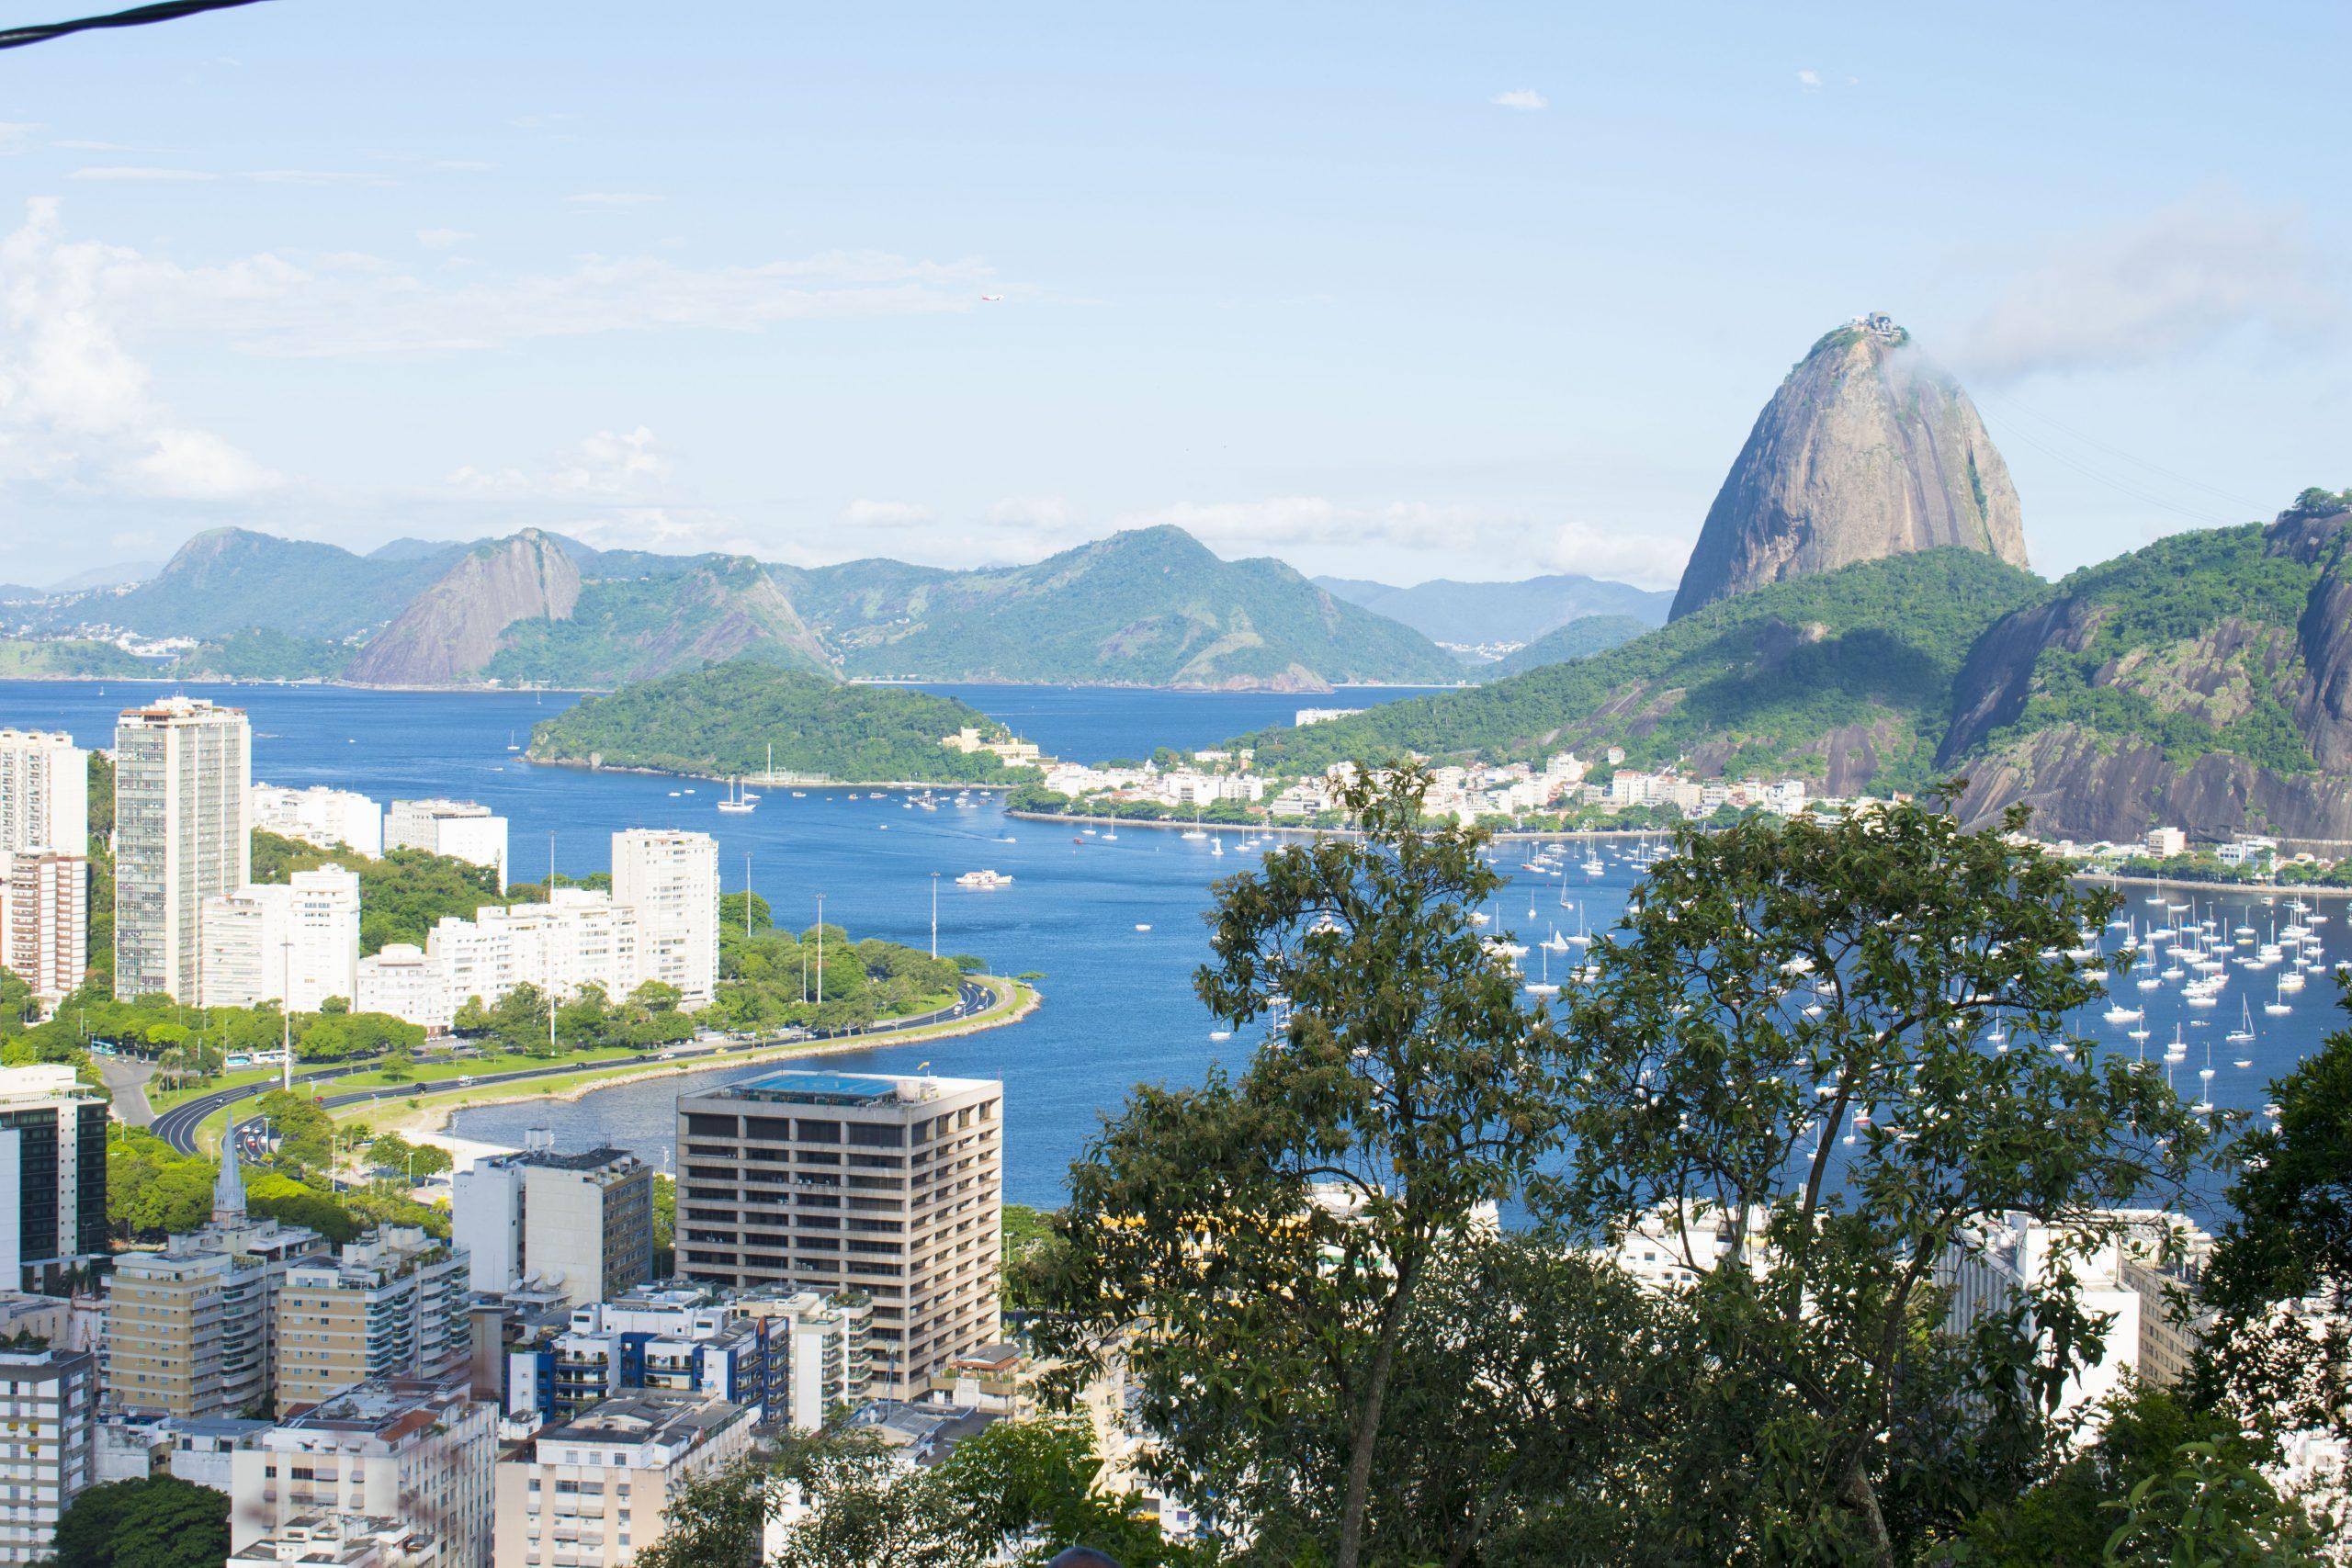 la baia di Botafogo